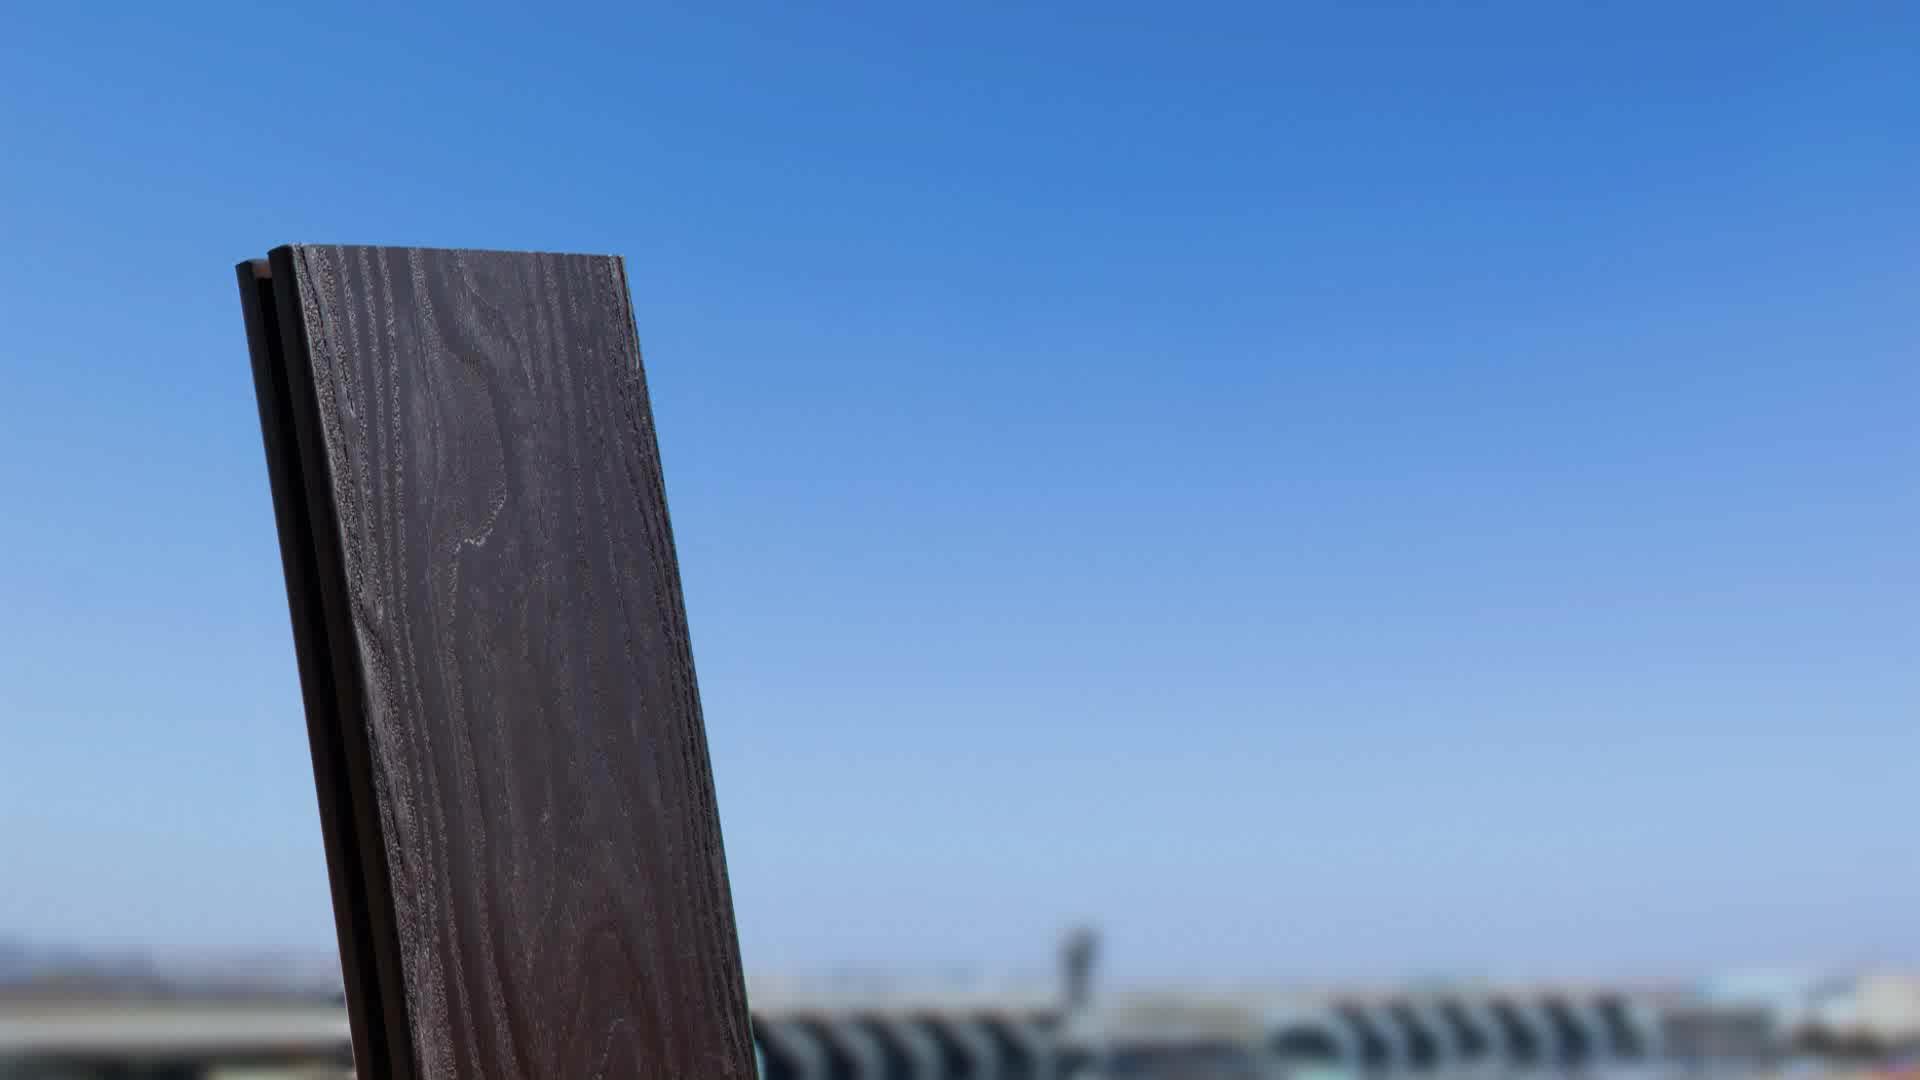 Outdoor Holz Verbund Wpc Decking Boden Bord